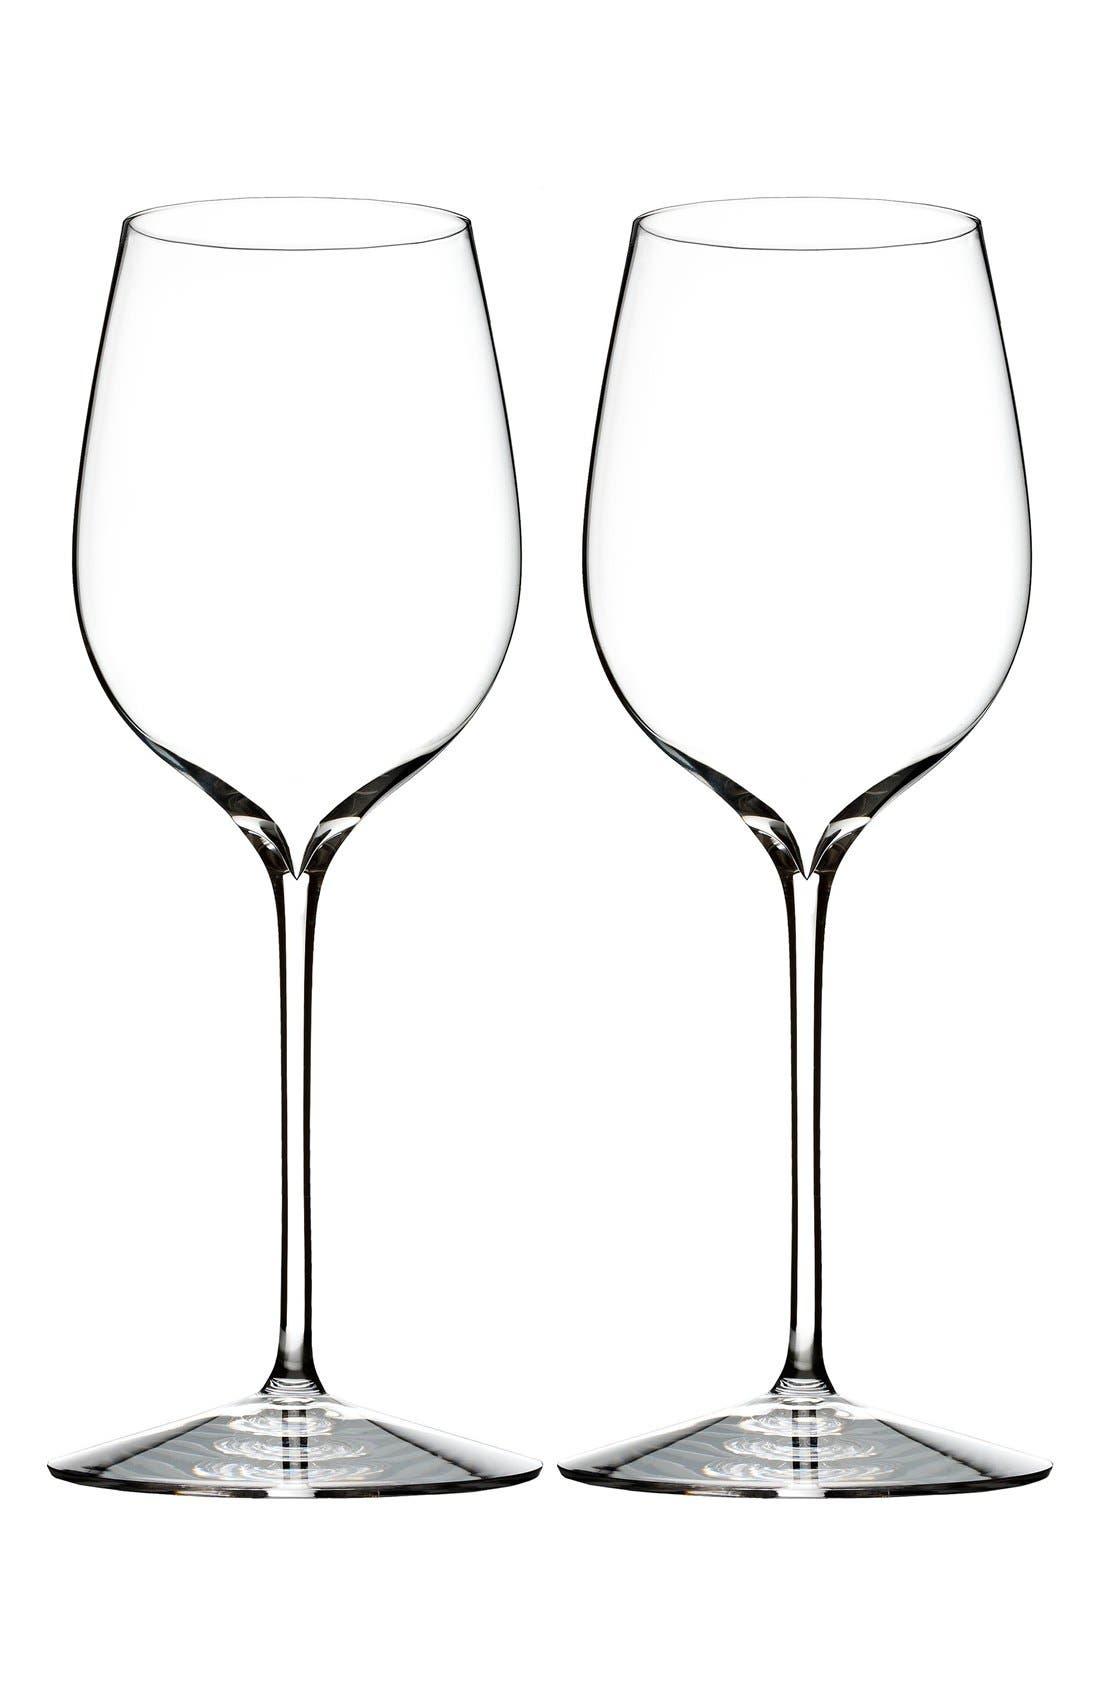 'Elegance' Fine Crystal Pinot Noir Glasses,                             Main thumbnail 1, color,                             100